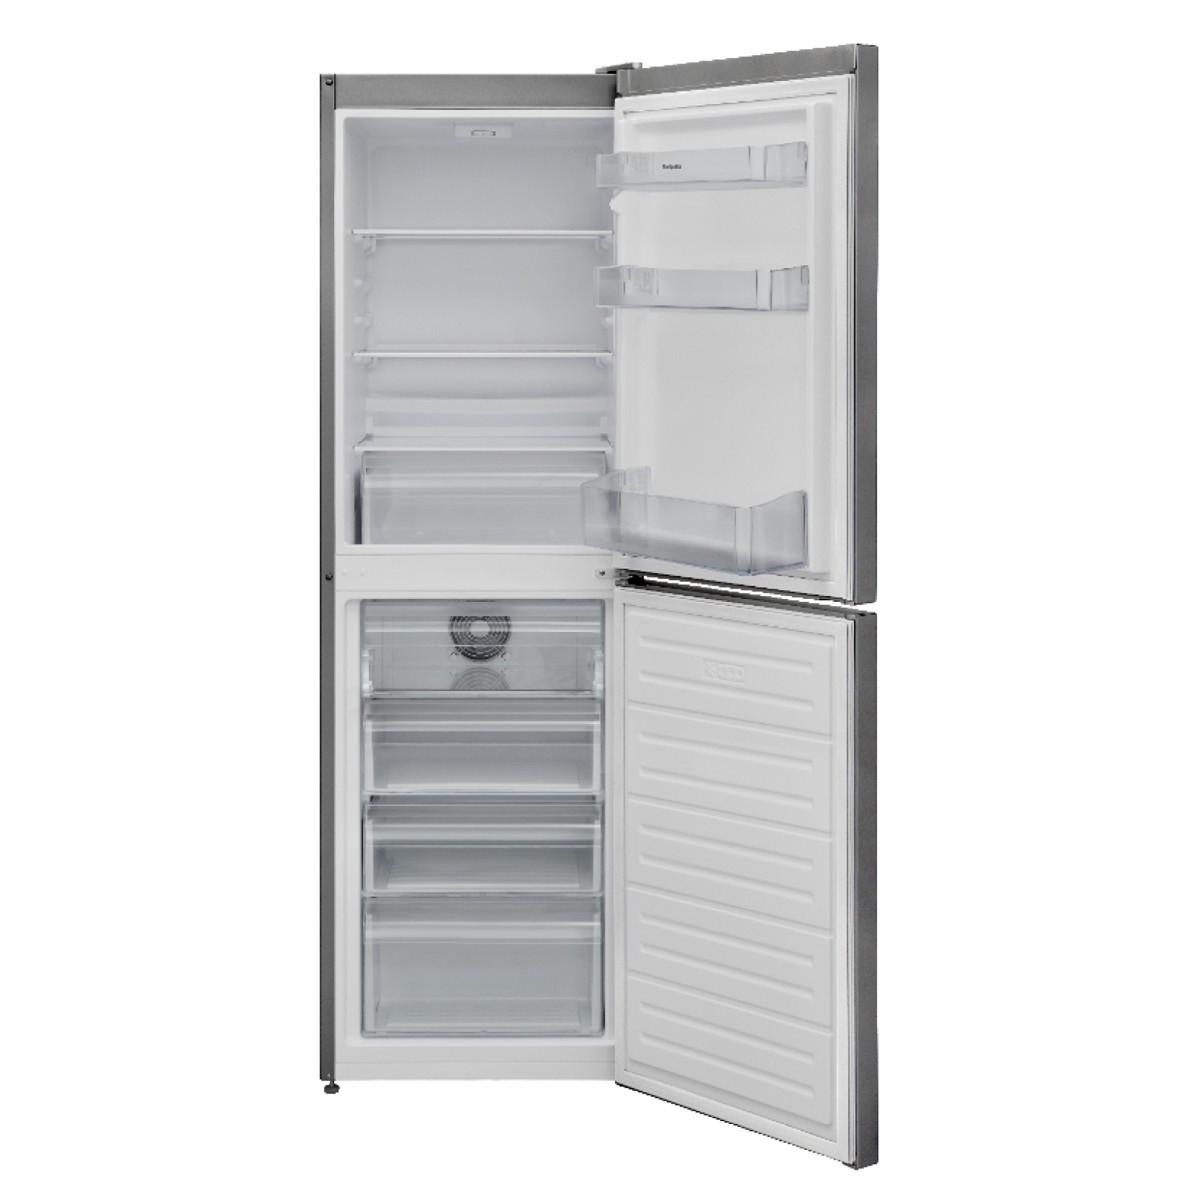 Montpellier MFF165S Fridge Freezer